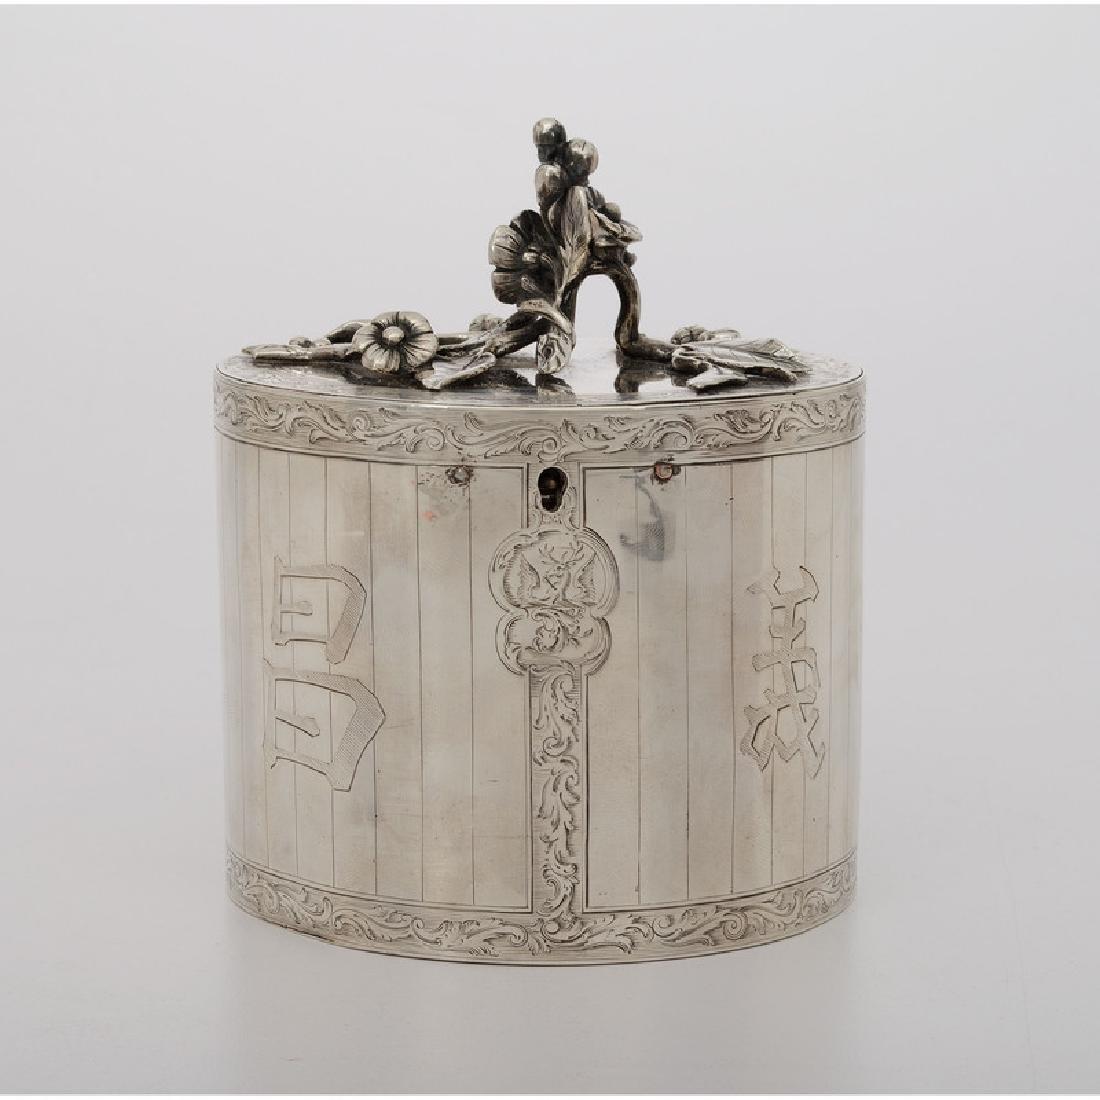 Chinoiserie Silver Tea Caddy, Parker & Wakelin